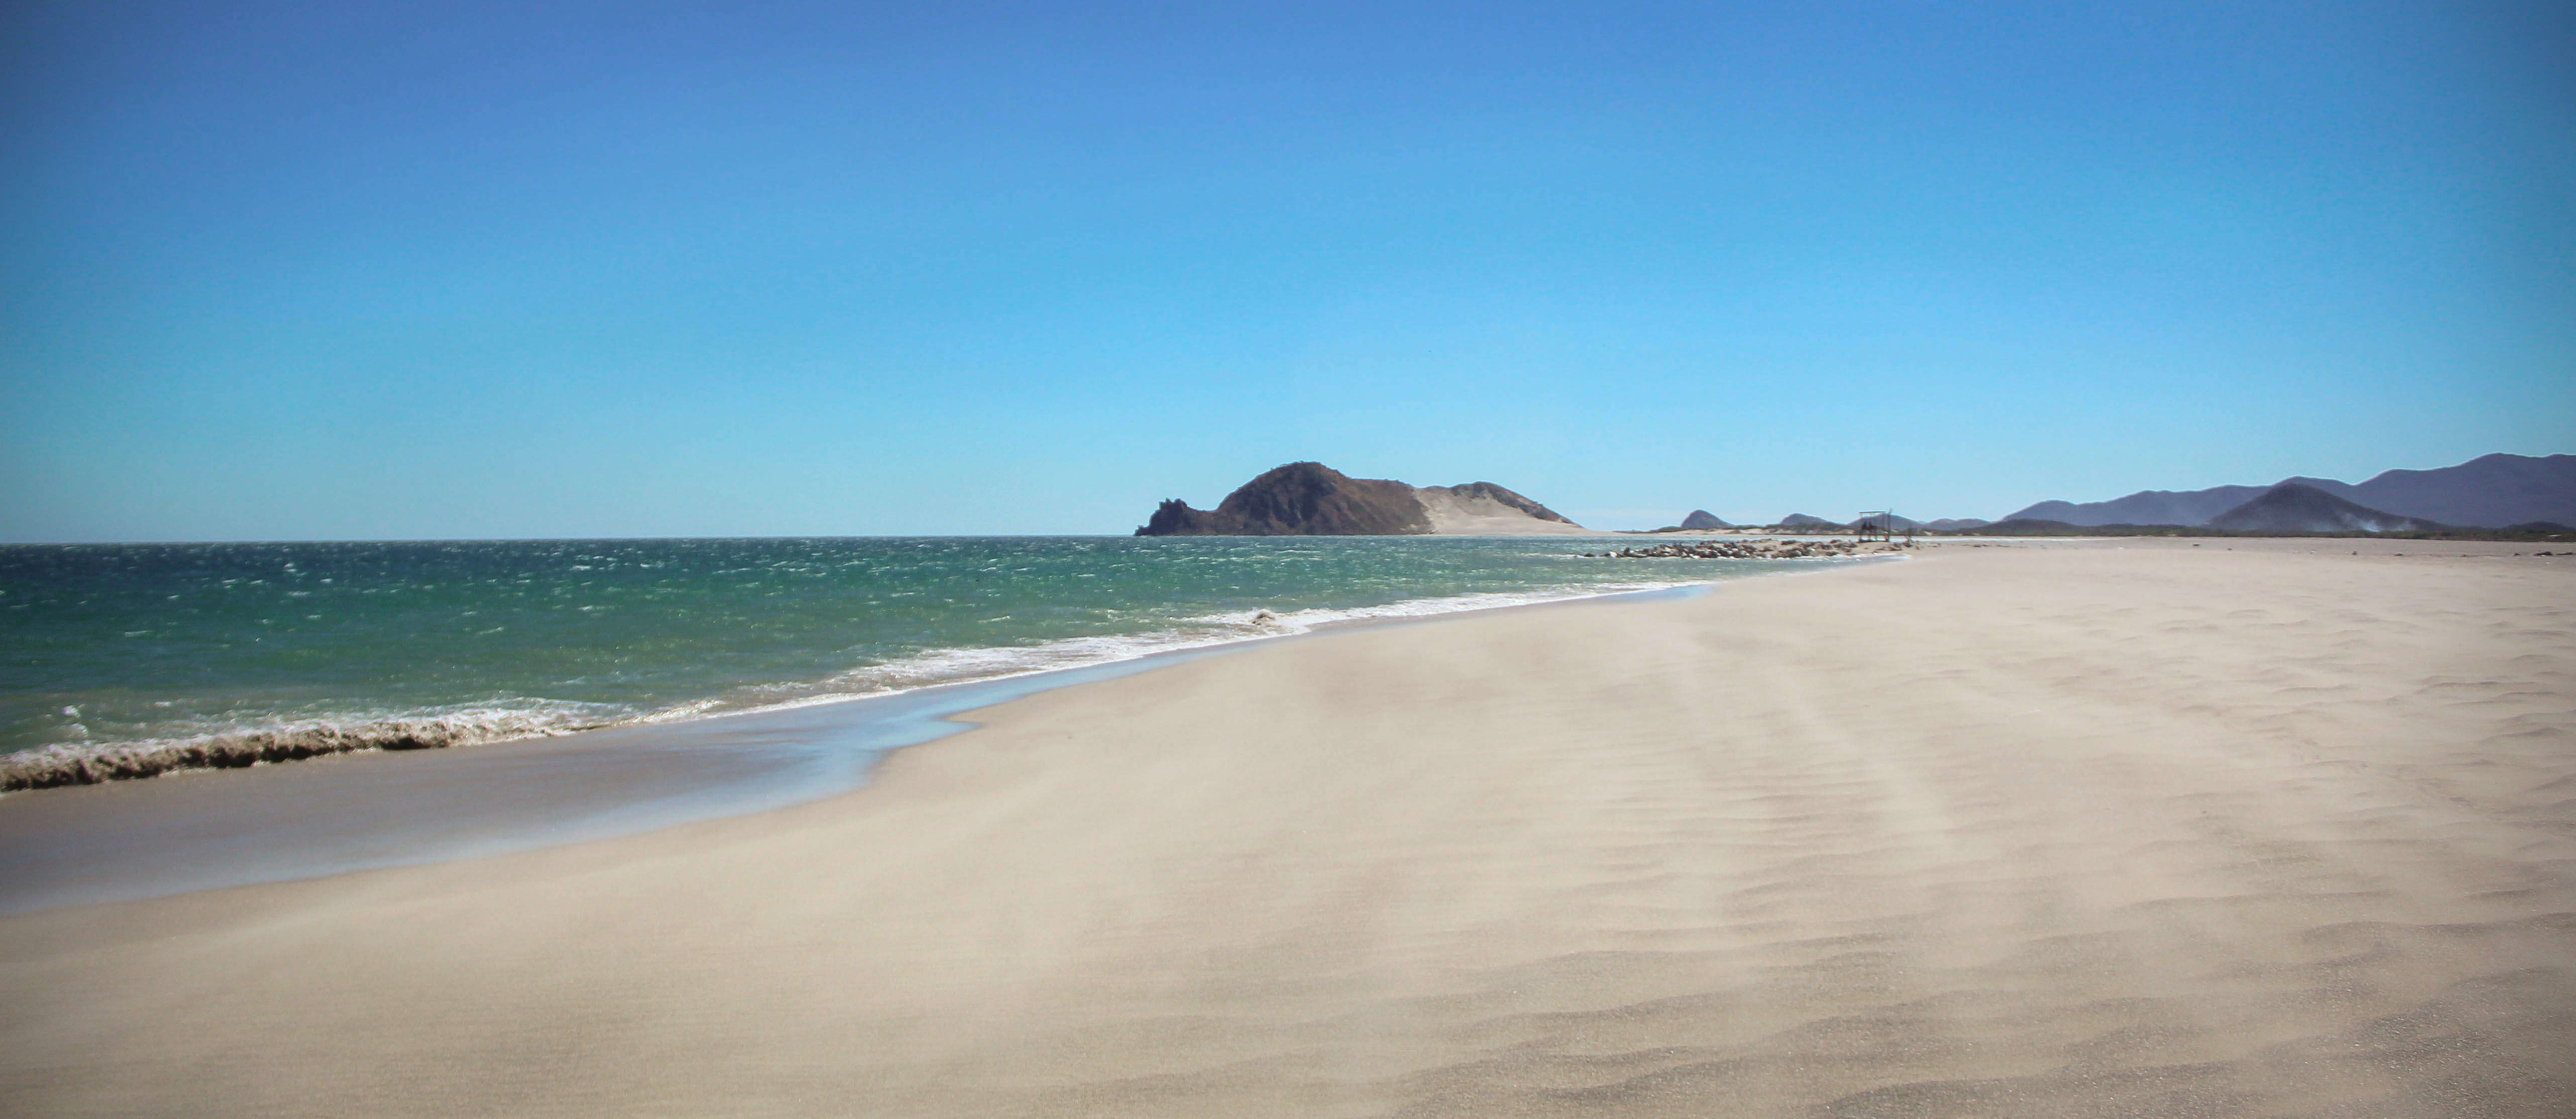 Playa Conejo